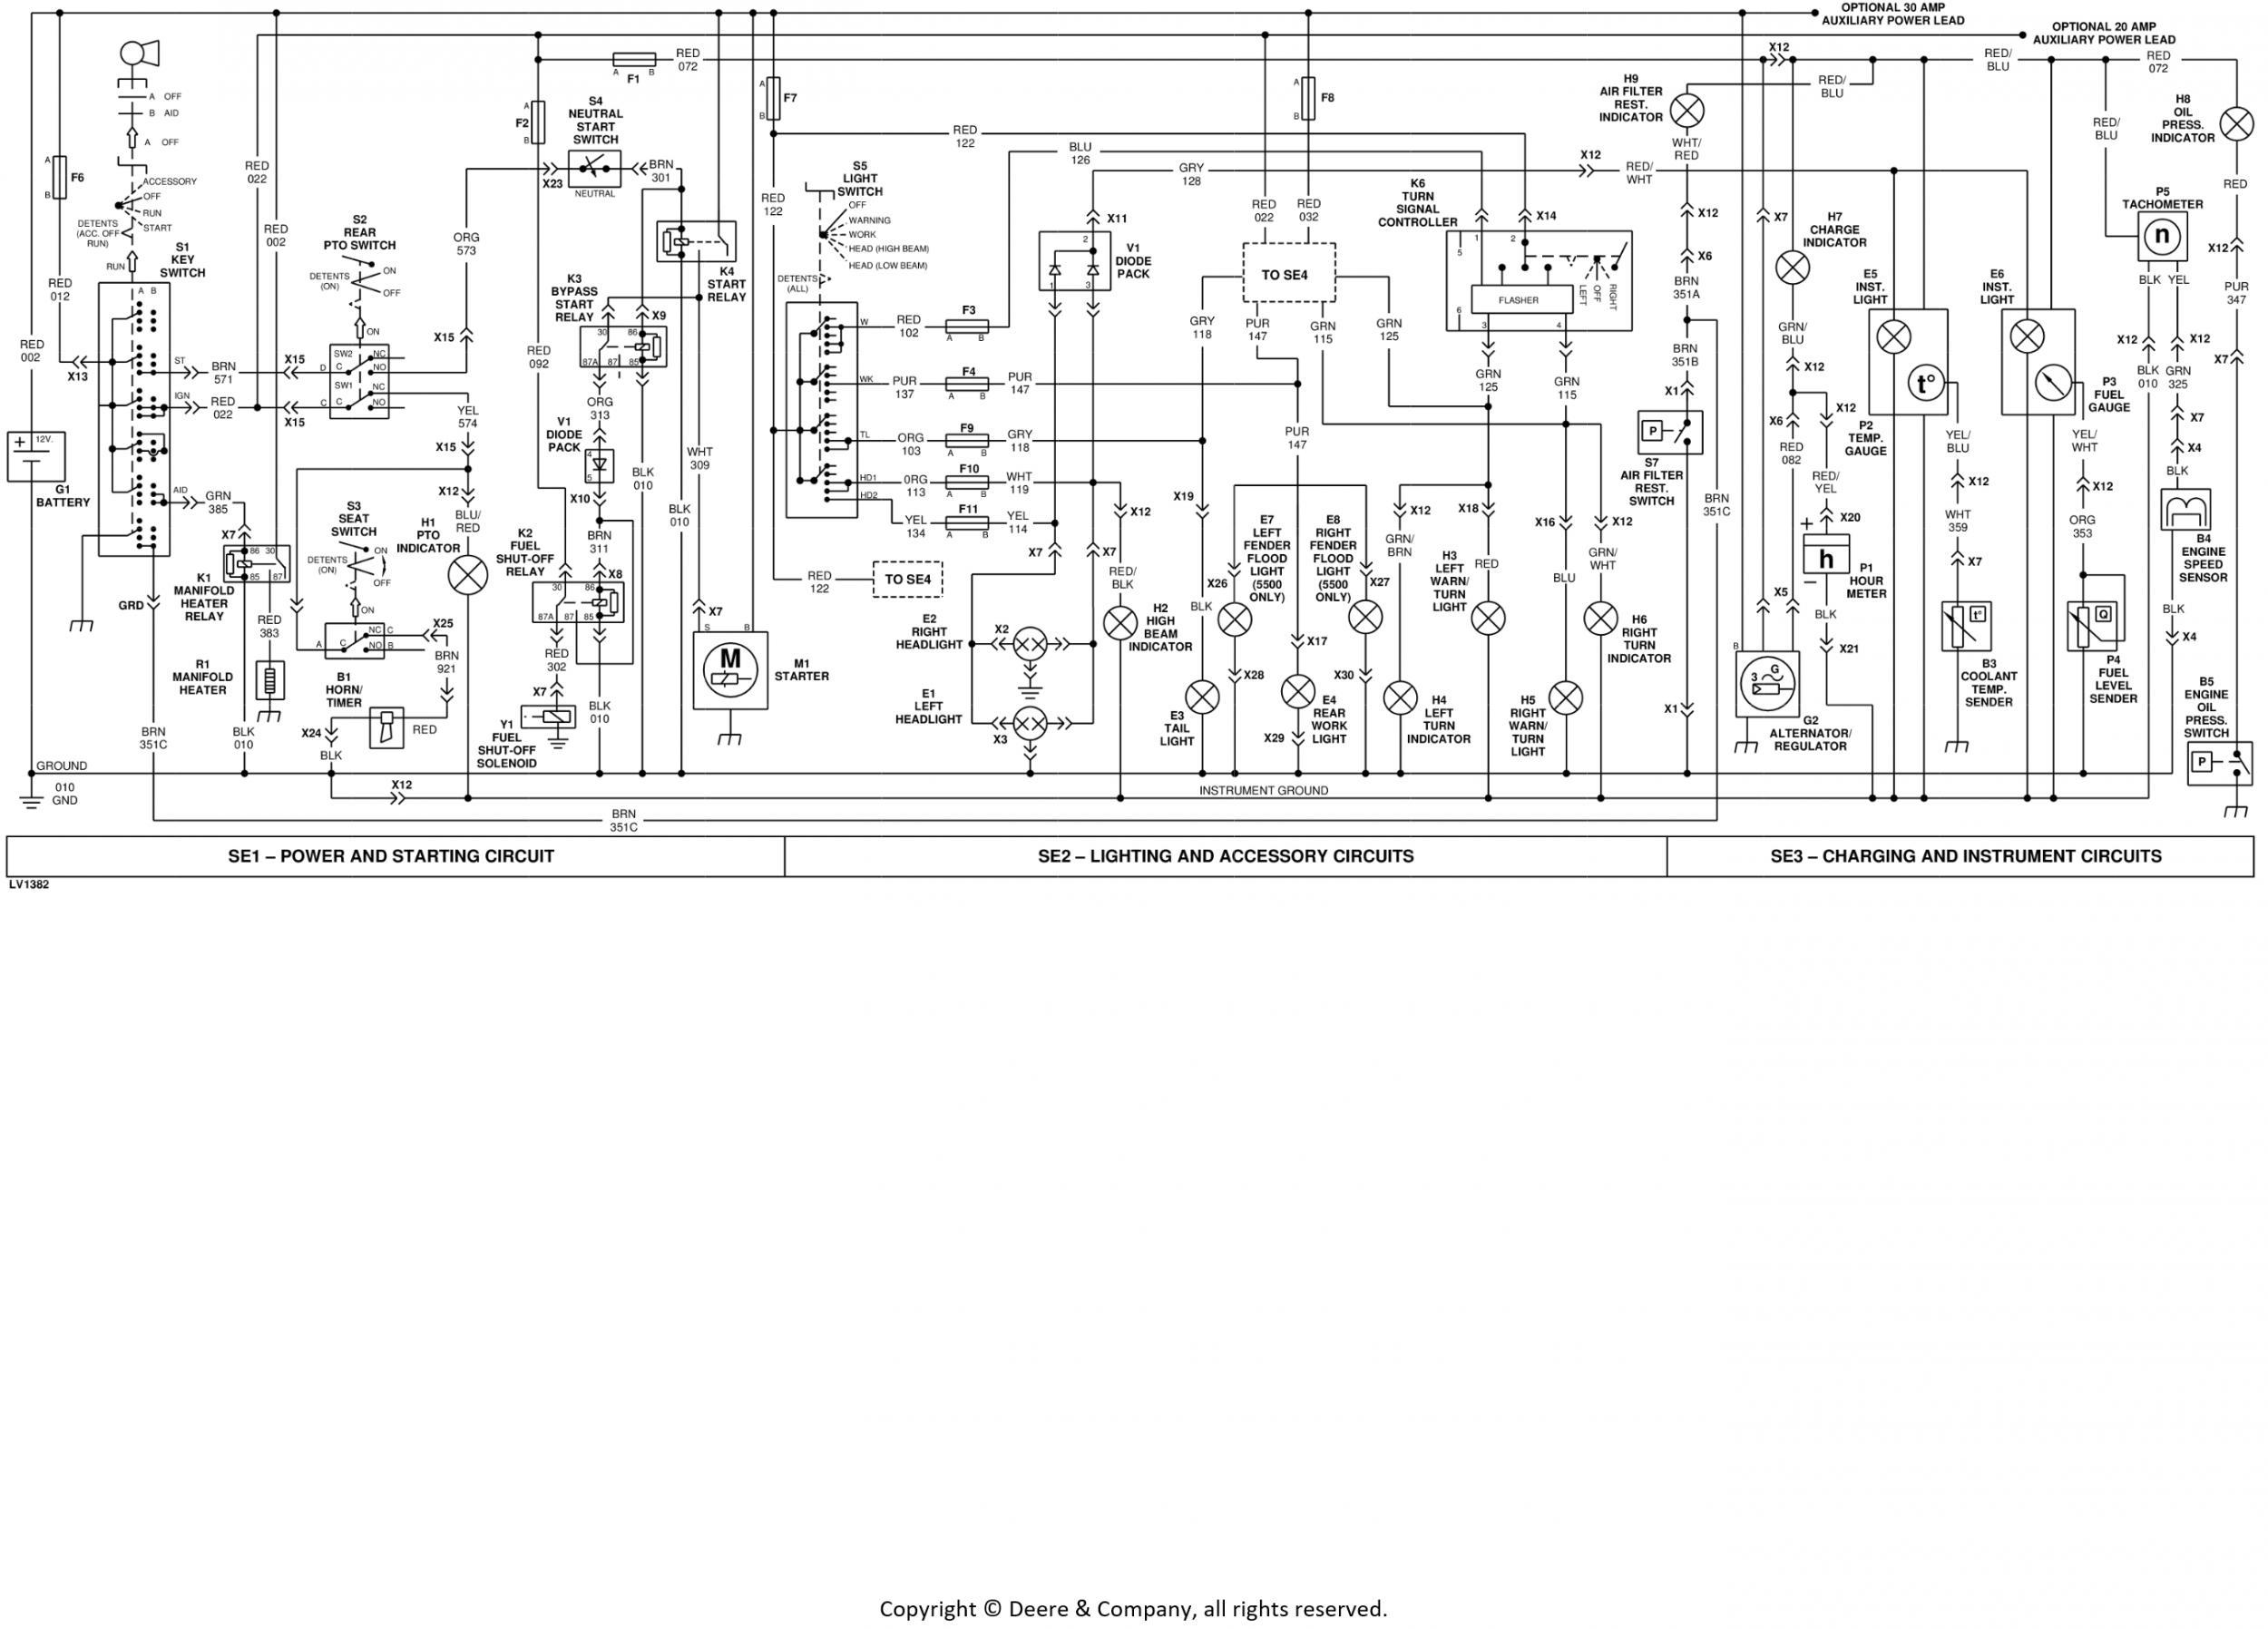 5400 Tachometer question..Please help!! | Green Tractor Talk | John Deere Tach Wiring Diagram |  | Green Tractor Talk